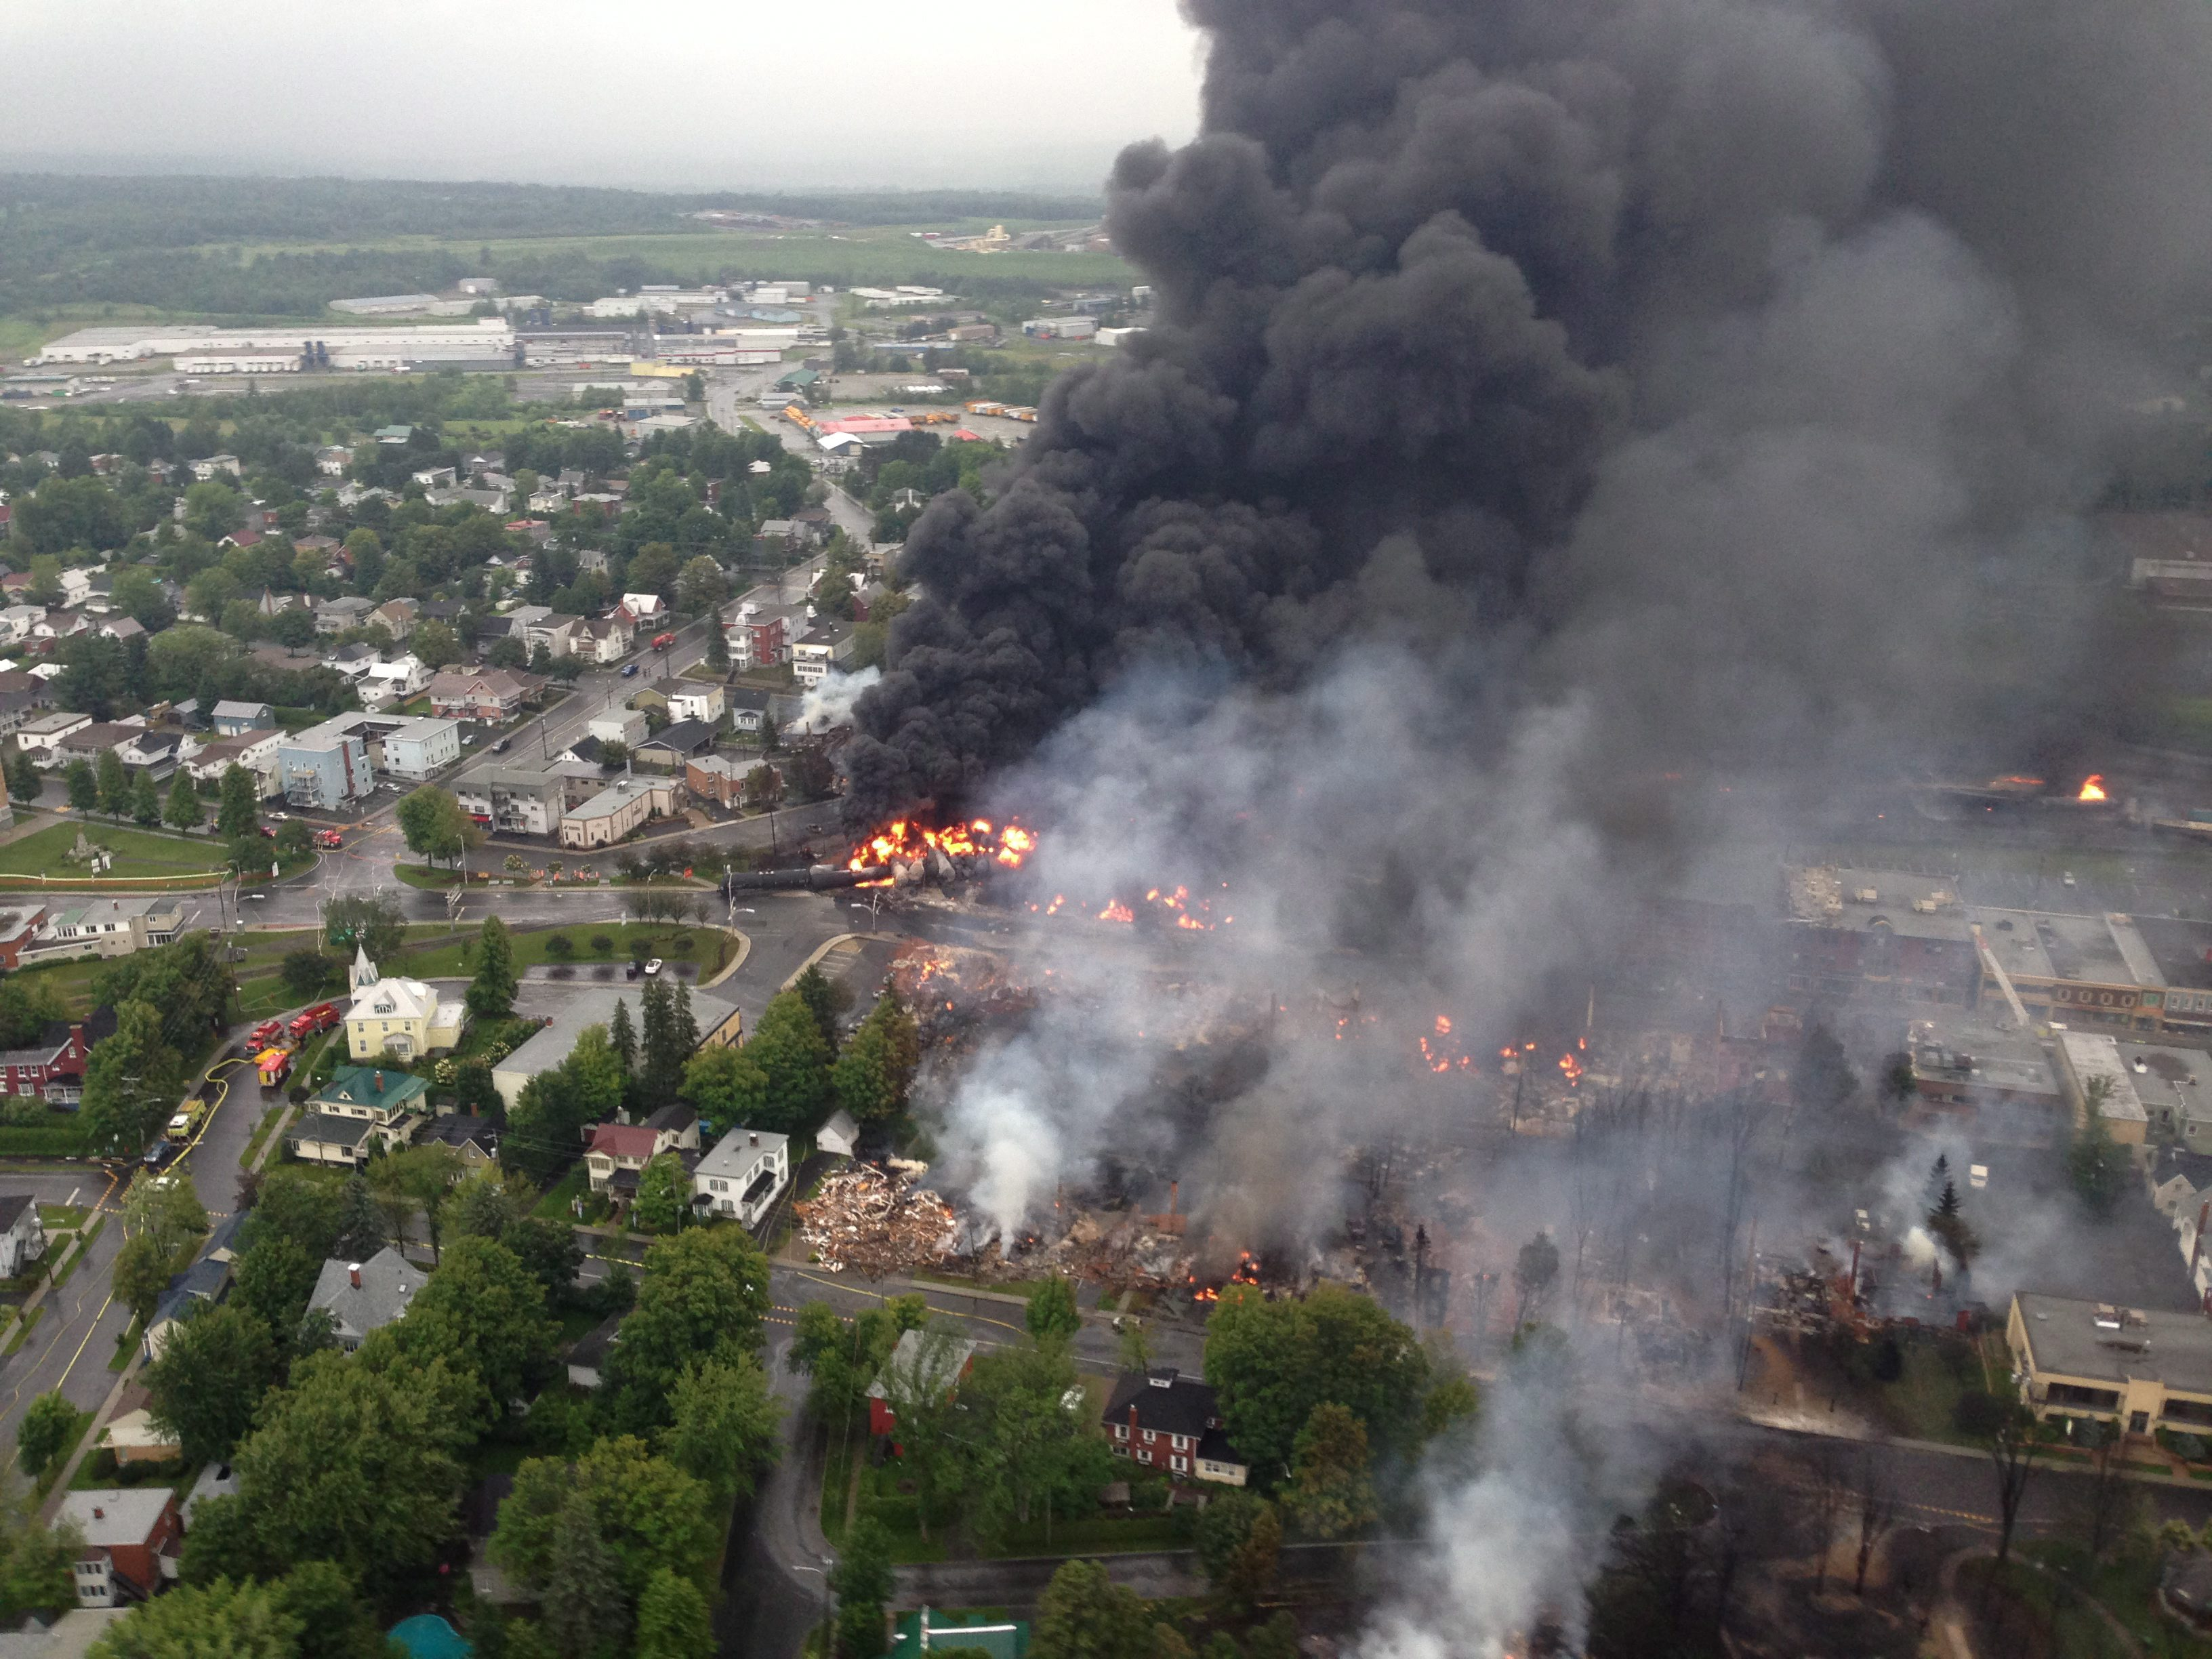 Gallery: Runaway train explodes in Canada